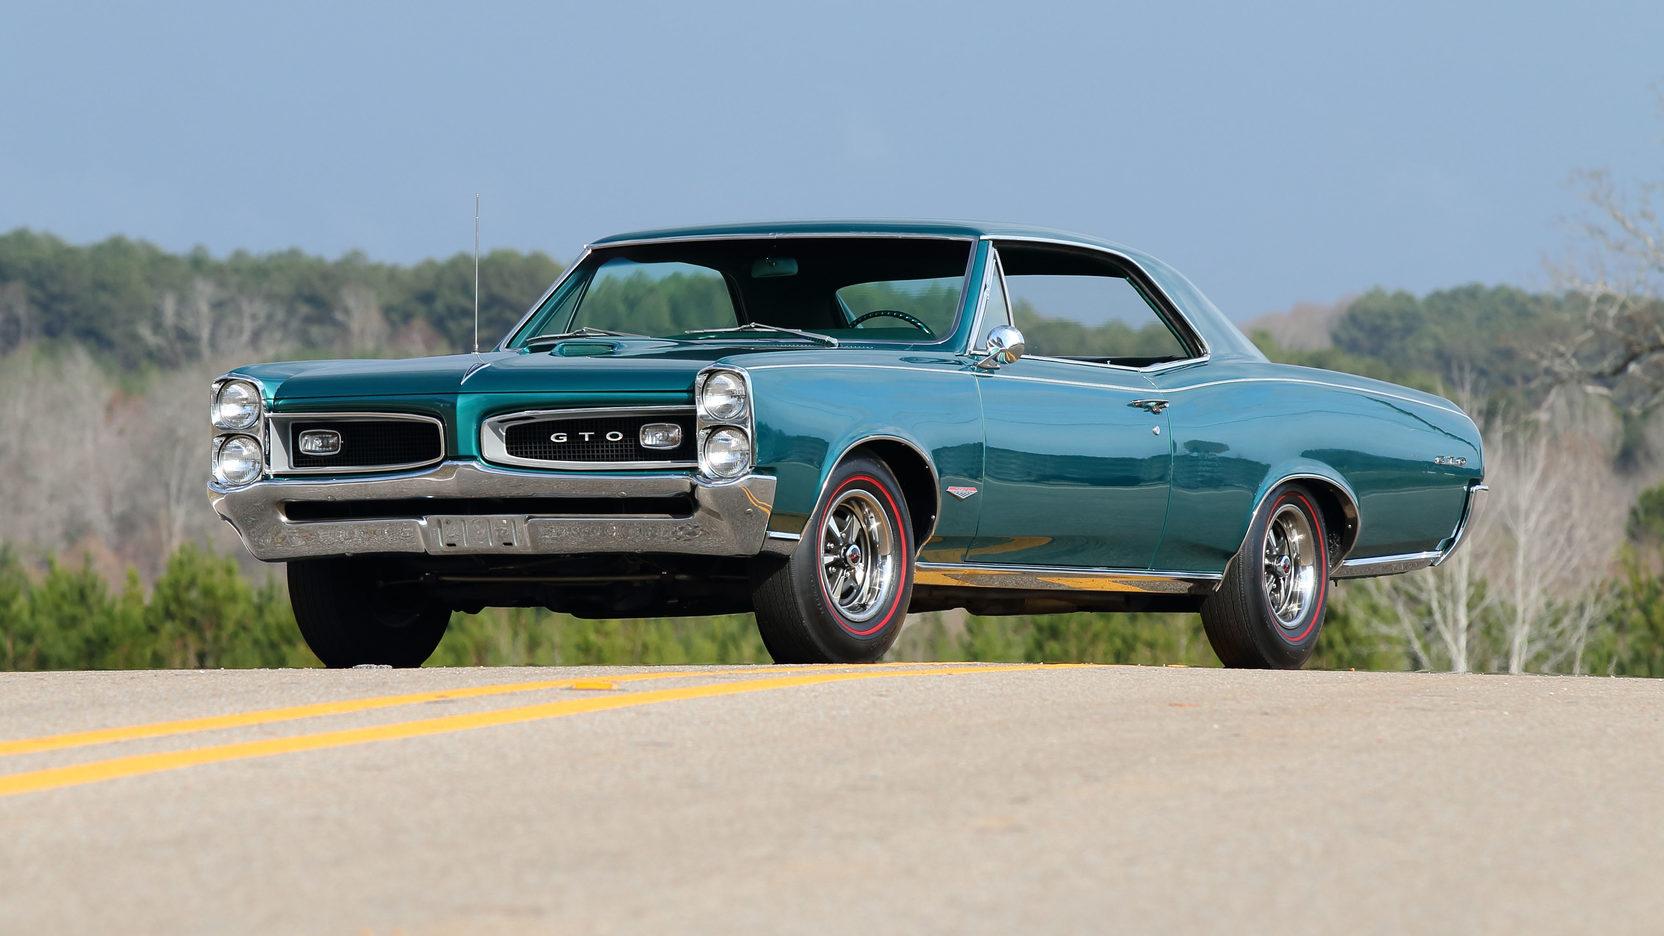 1966 Pontiac GTO teal front 3/4